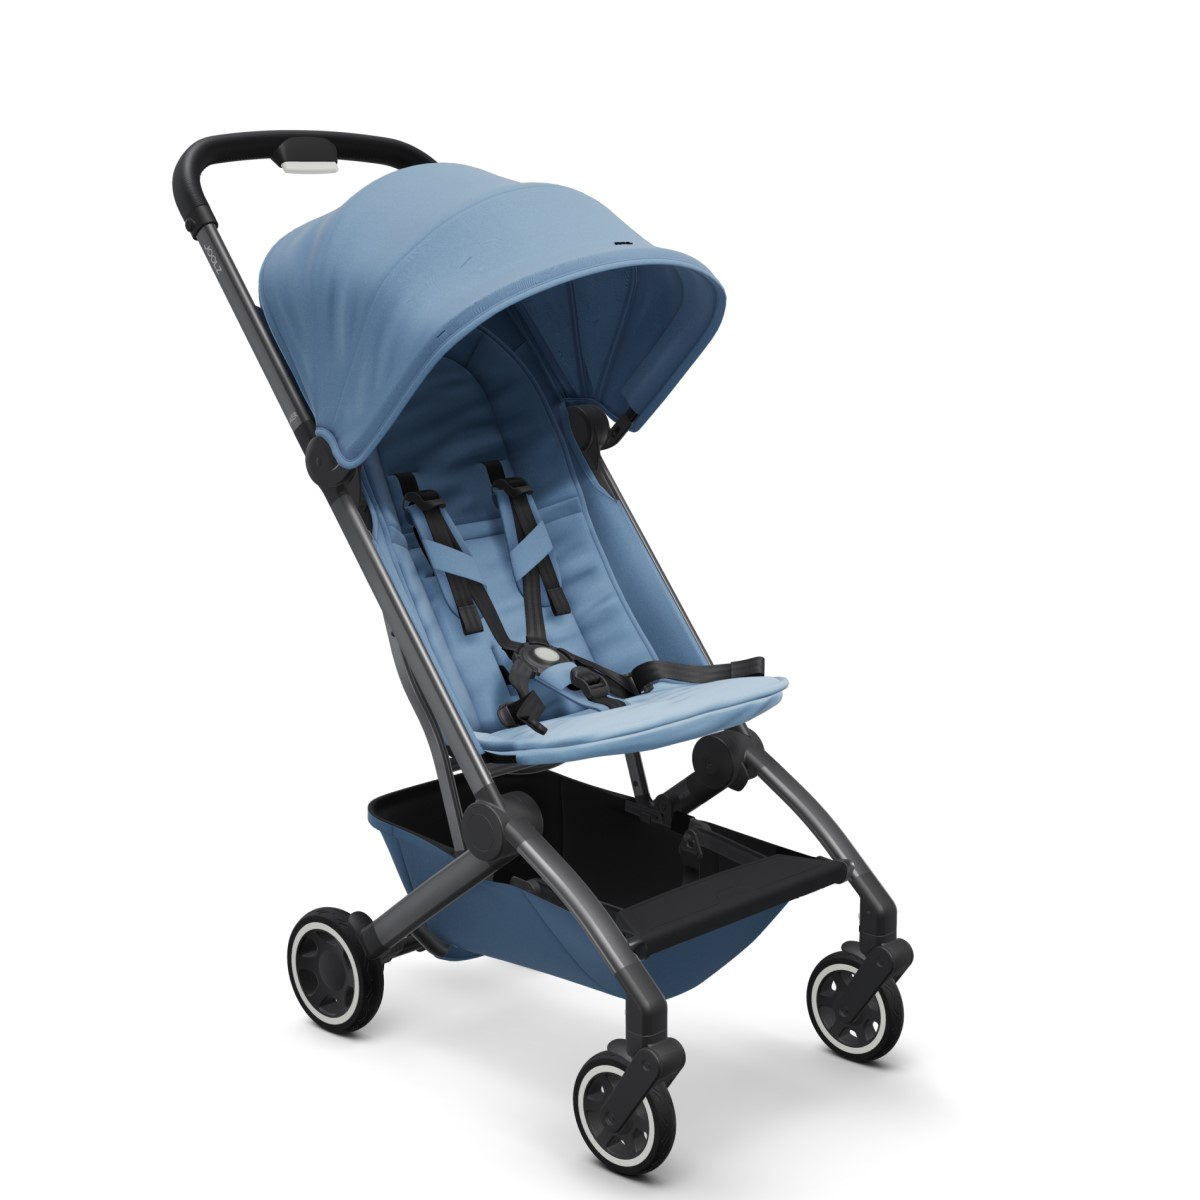 96232-SILLA PASEO JOOLZ AER SPLENDID BLUE(0-0)-0